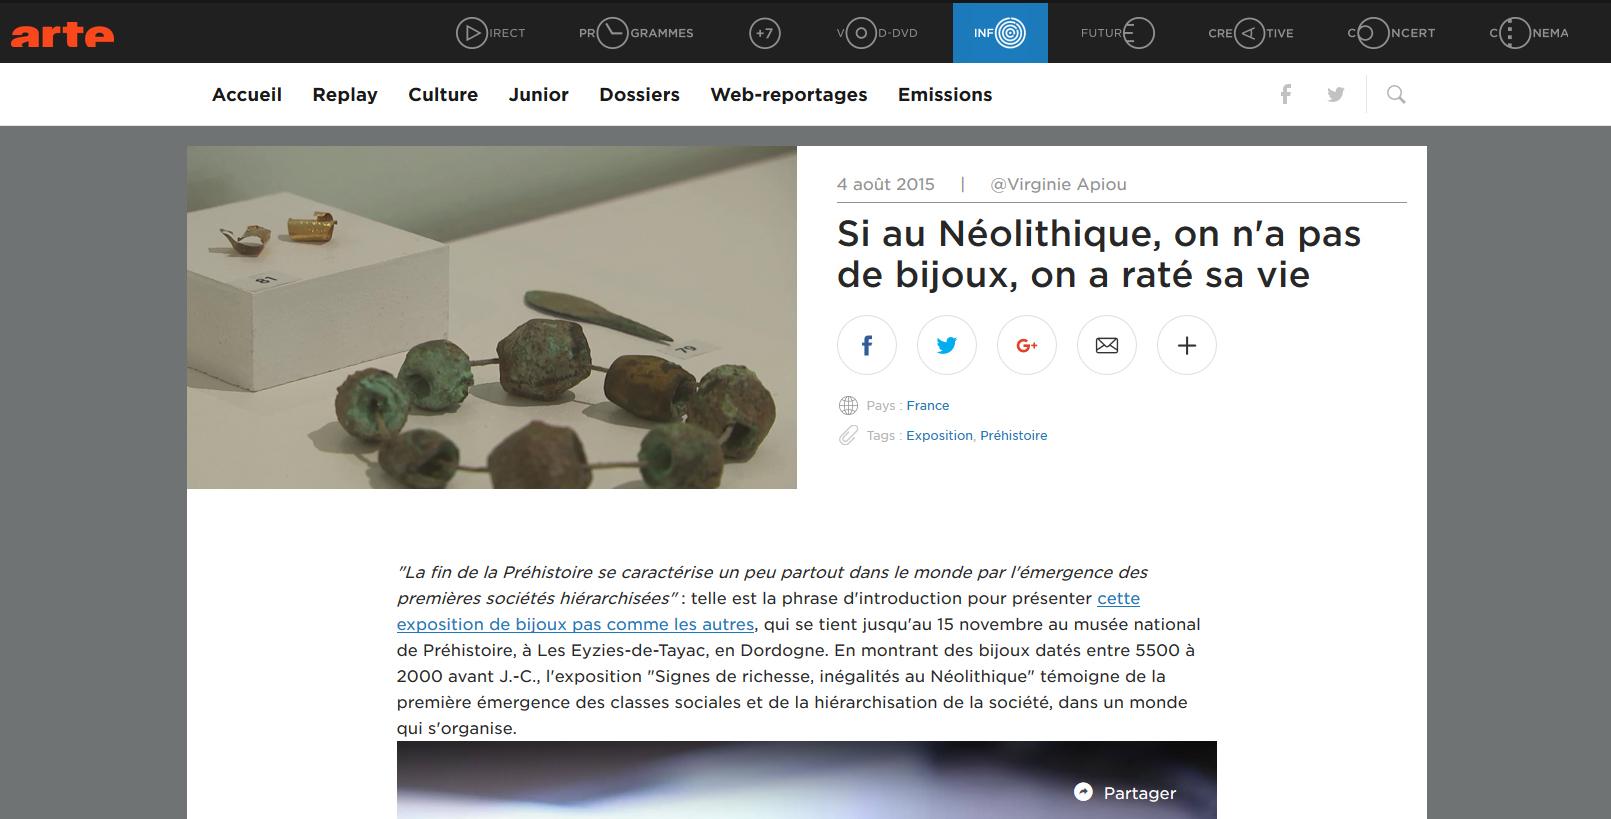 ill-pressbook-arte-bijoux-neolithique.jpg